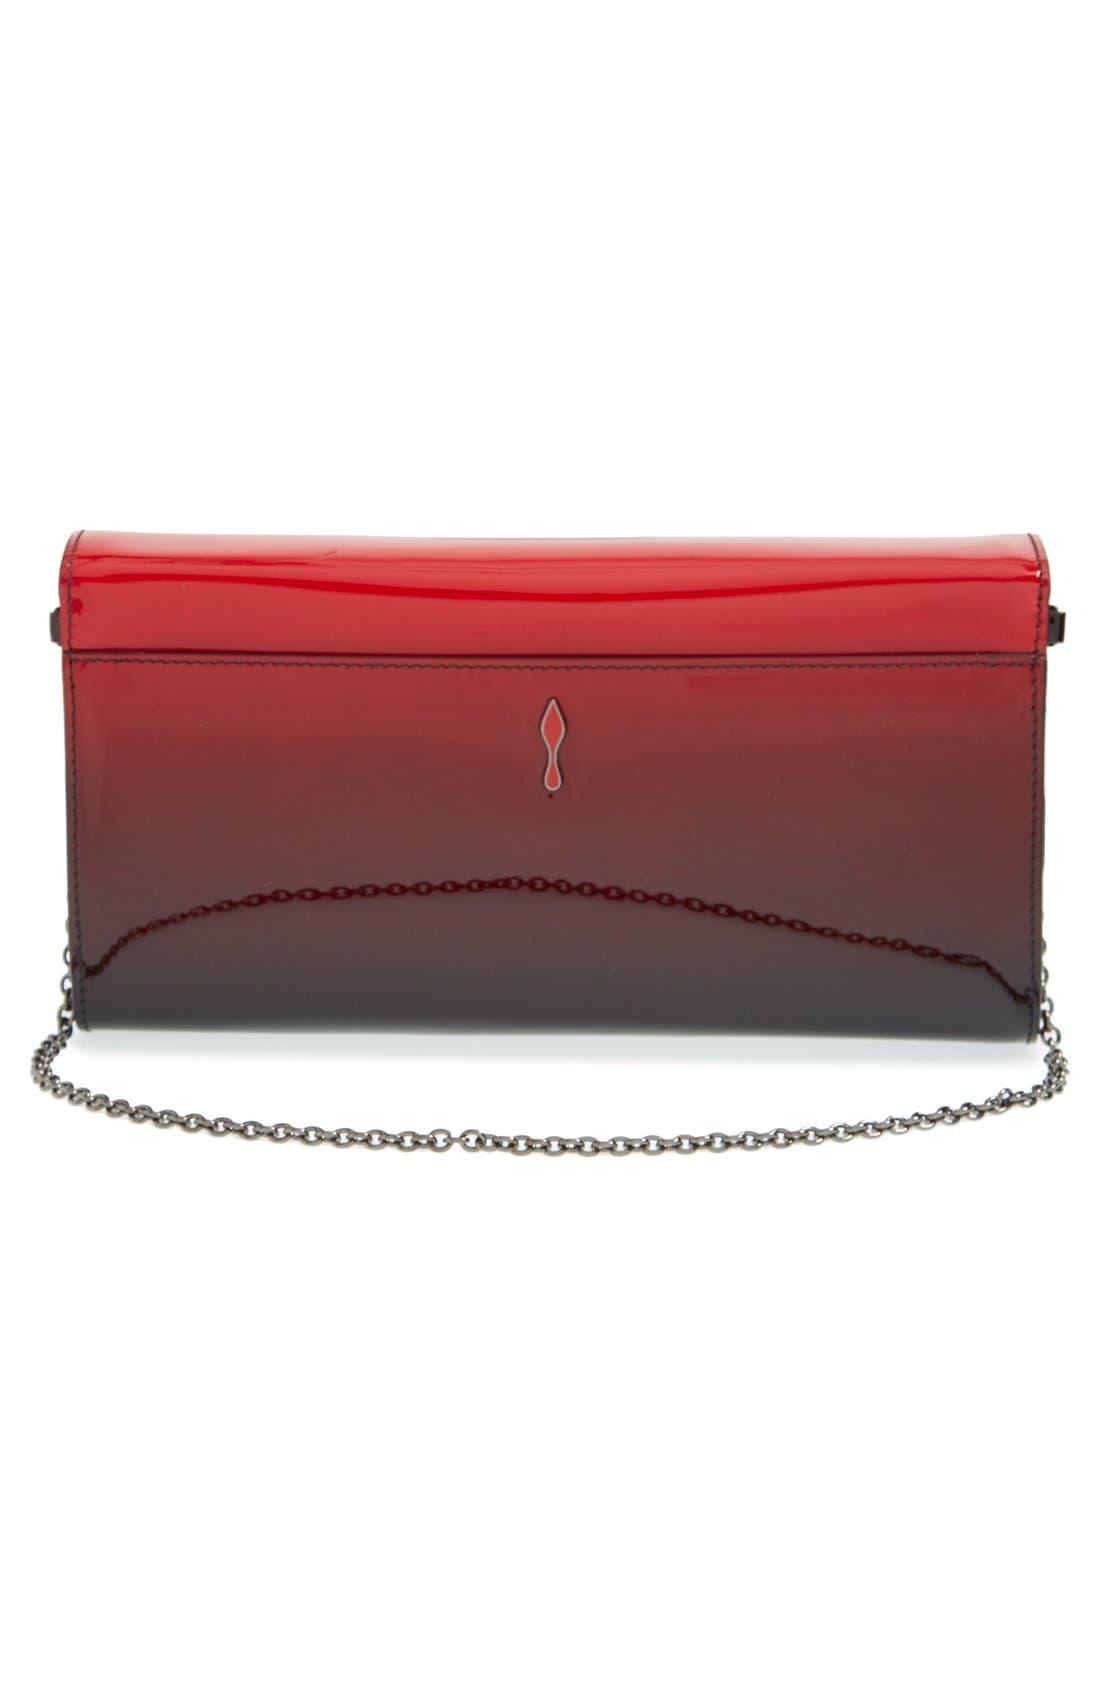 Alternate Image 3  - Christian Louboutin 'Riviera' Dégradé Patent Leather Clutch